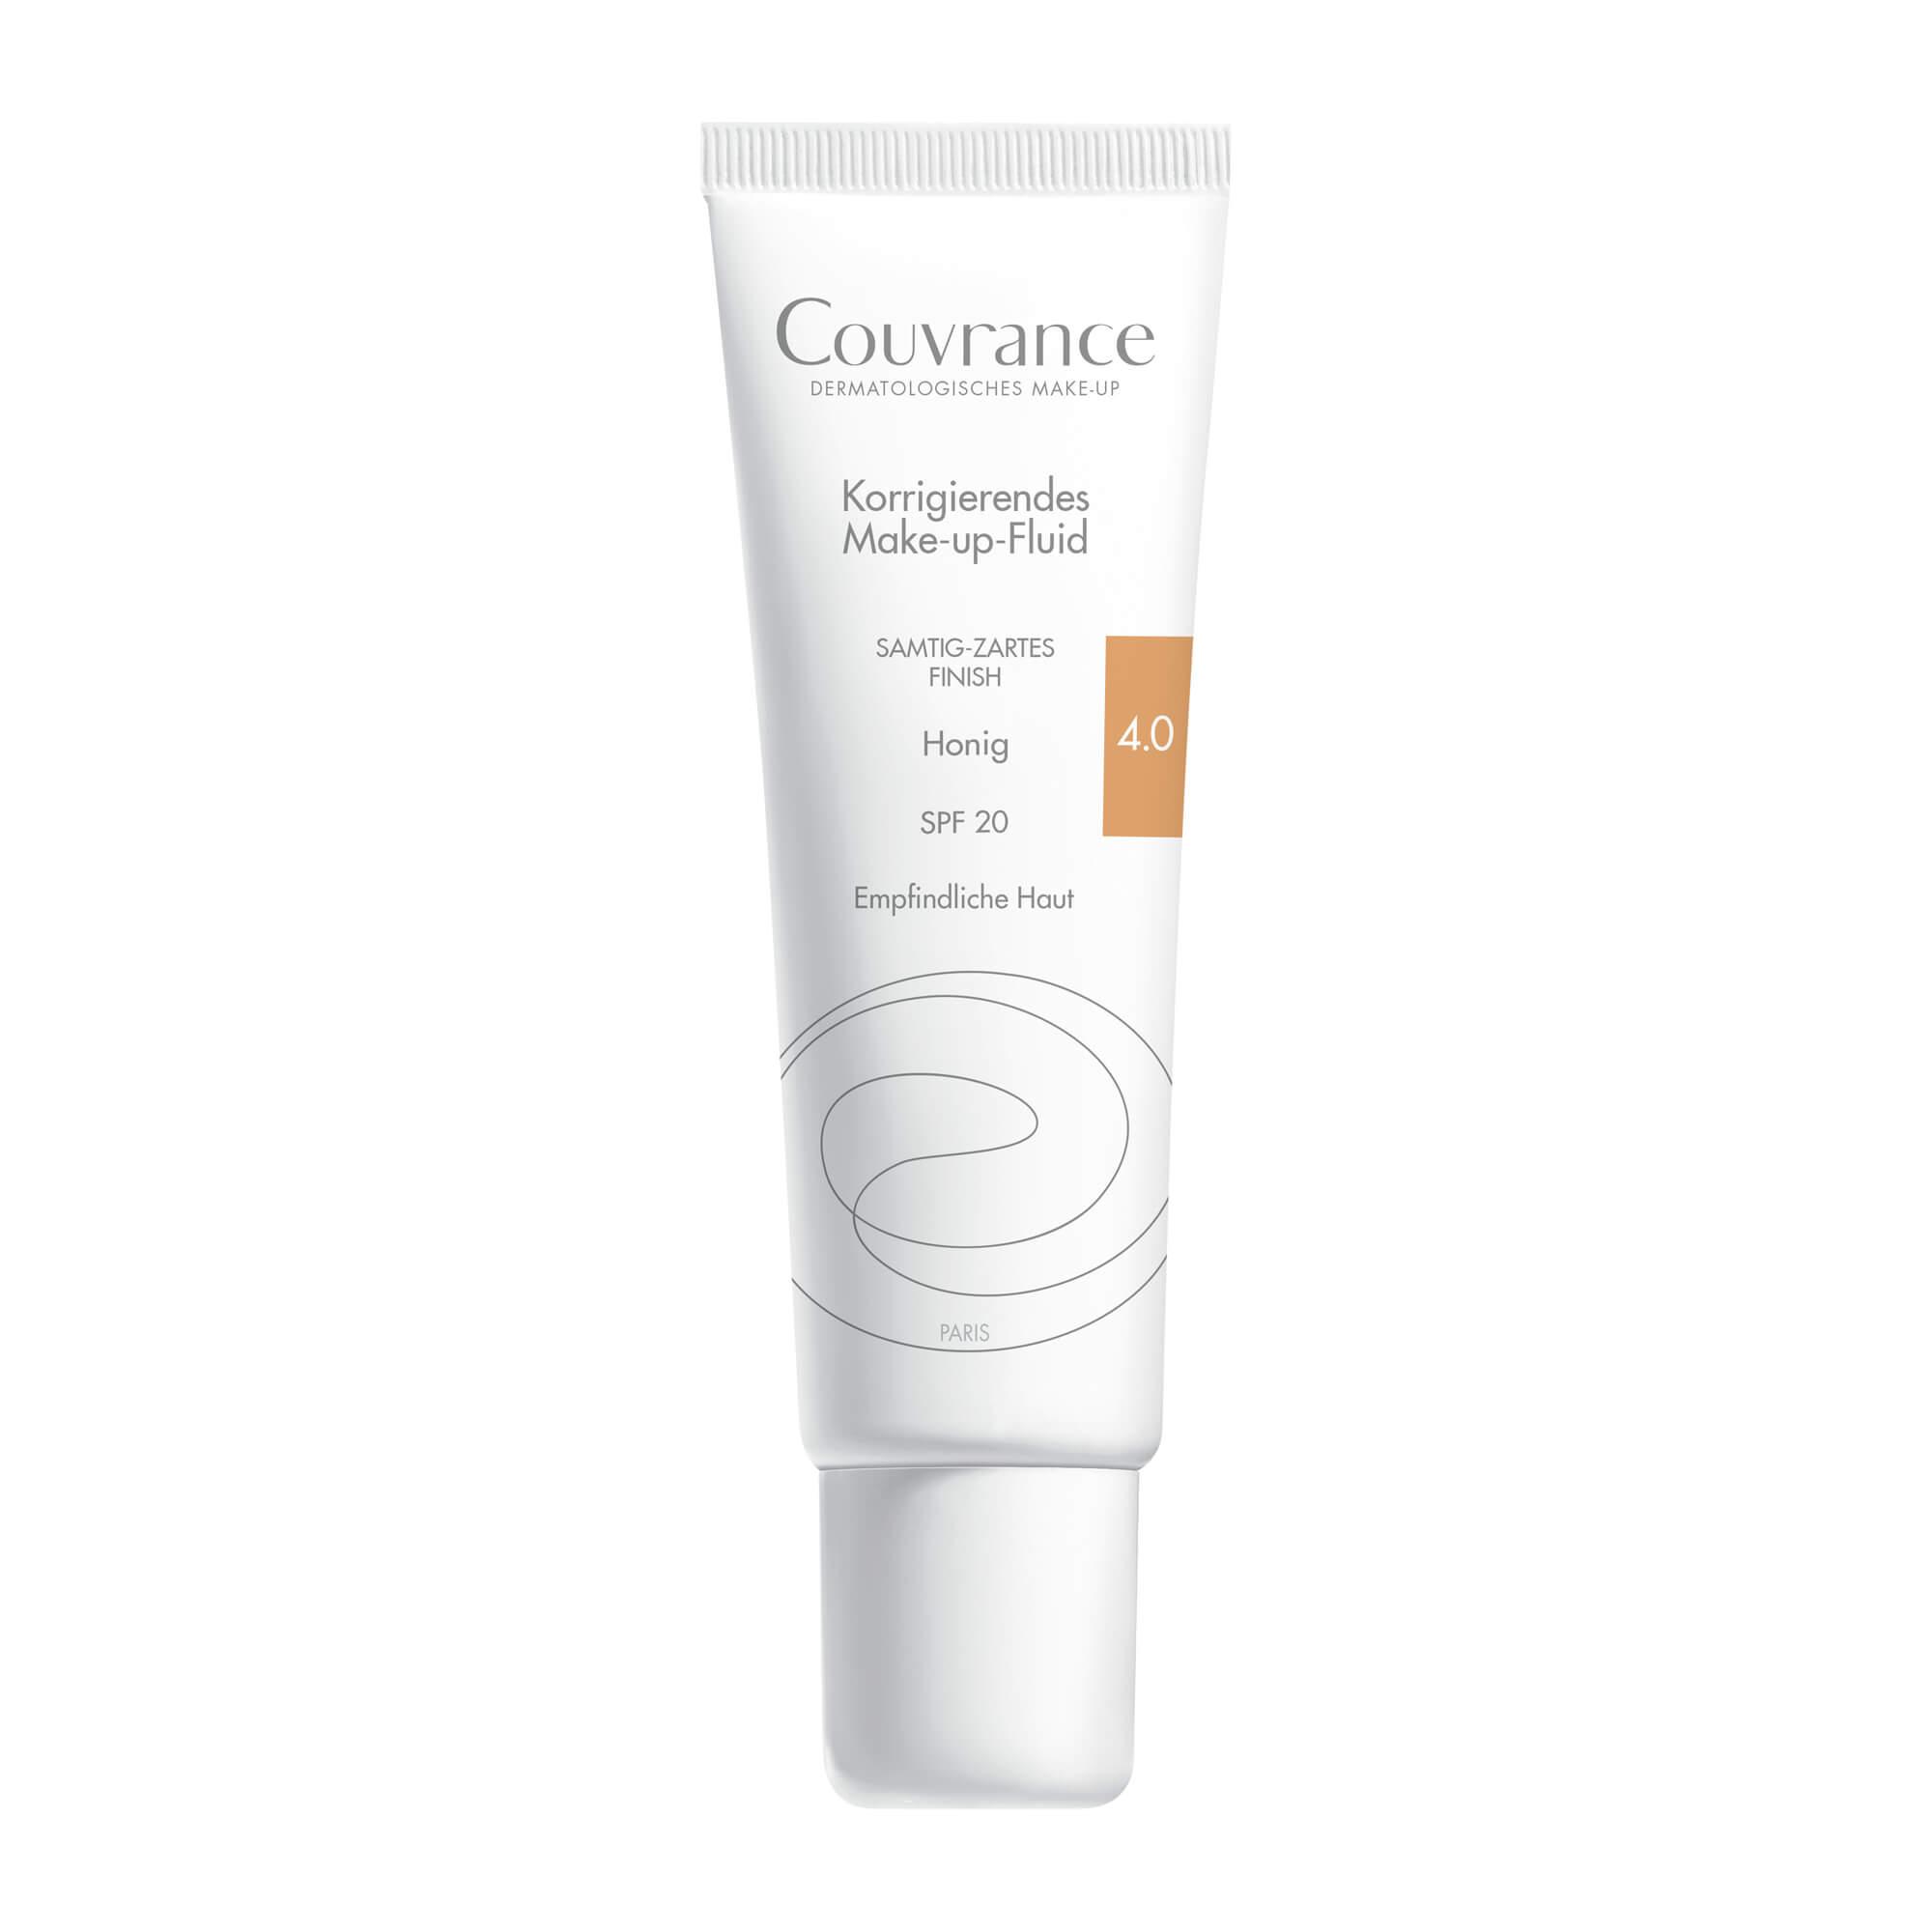 Avene Couvrance Korrigierendes Make-up Fluid Honig